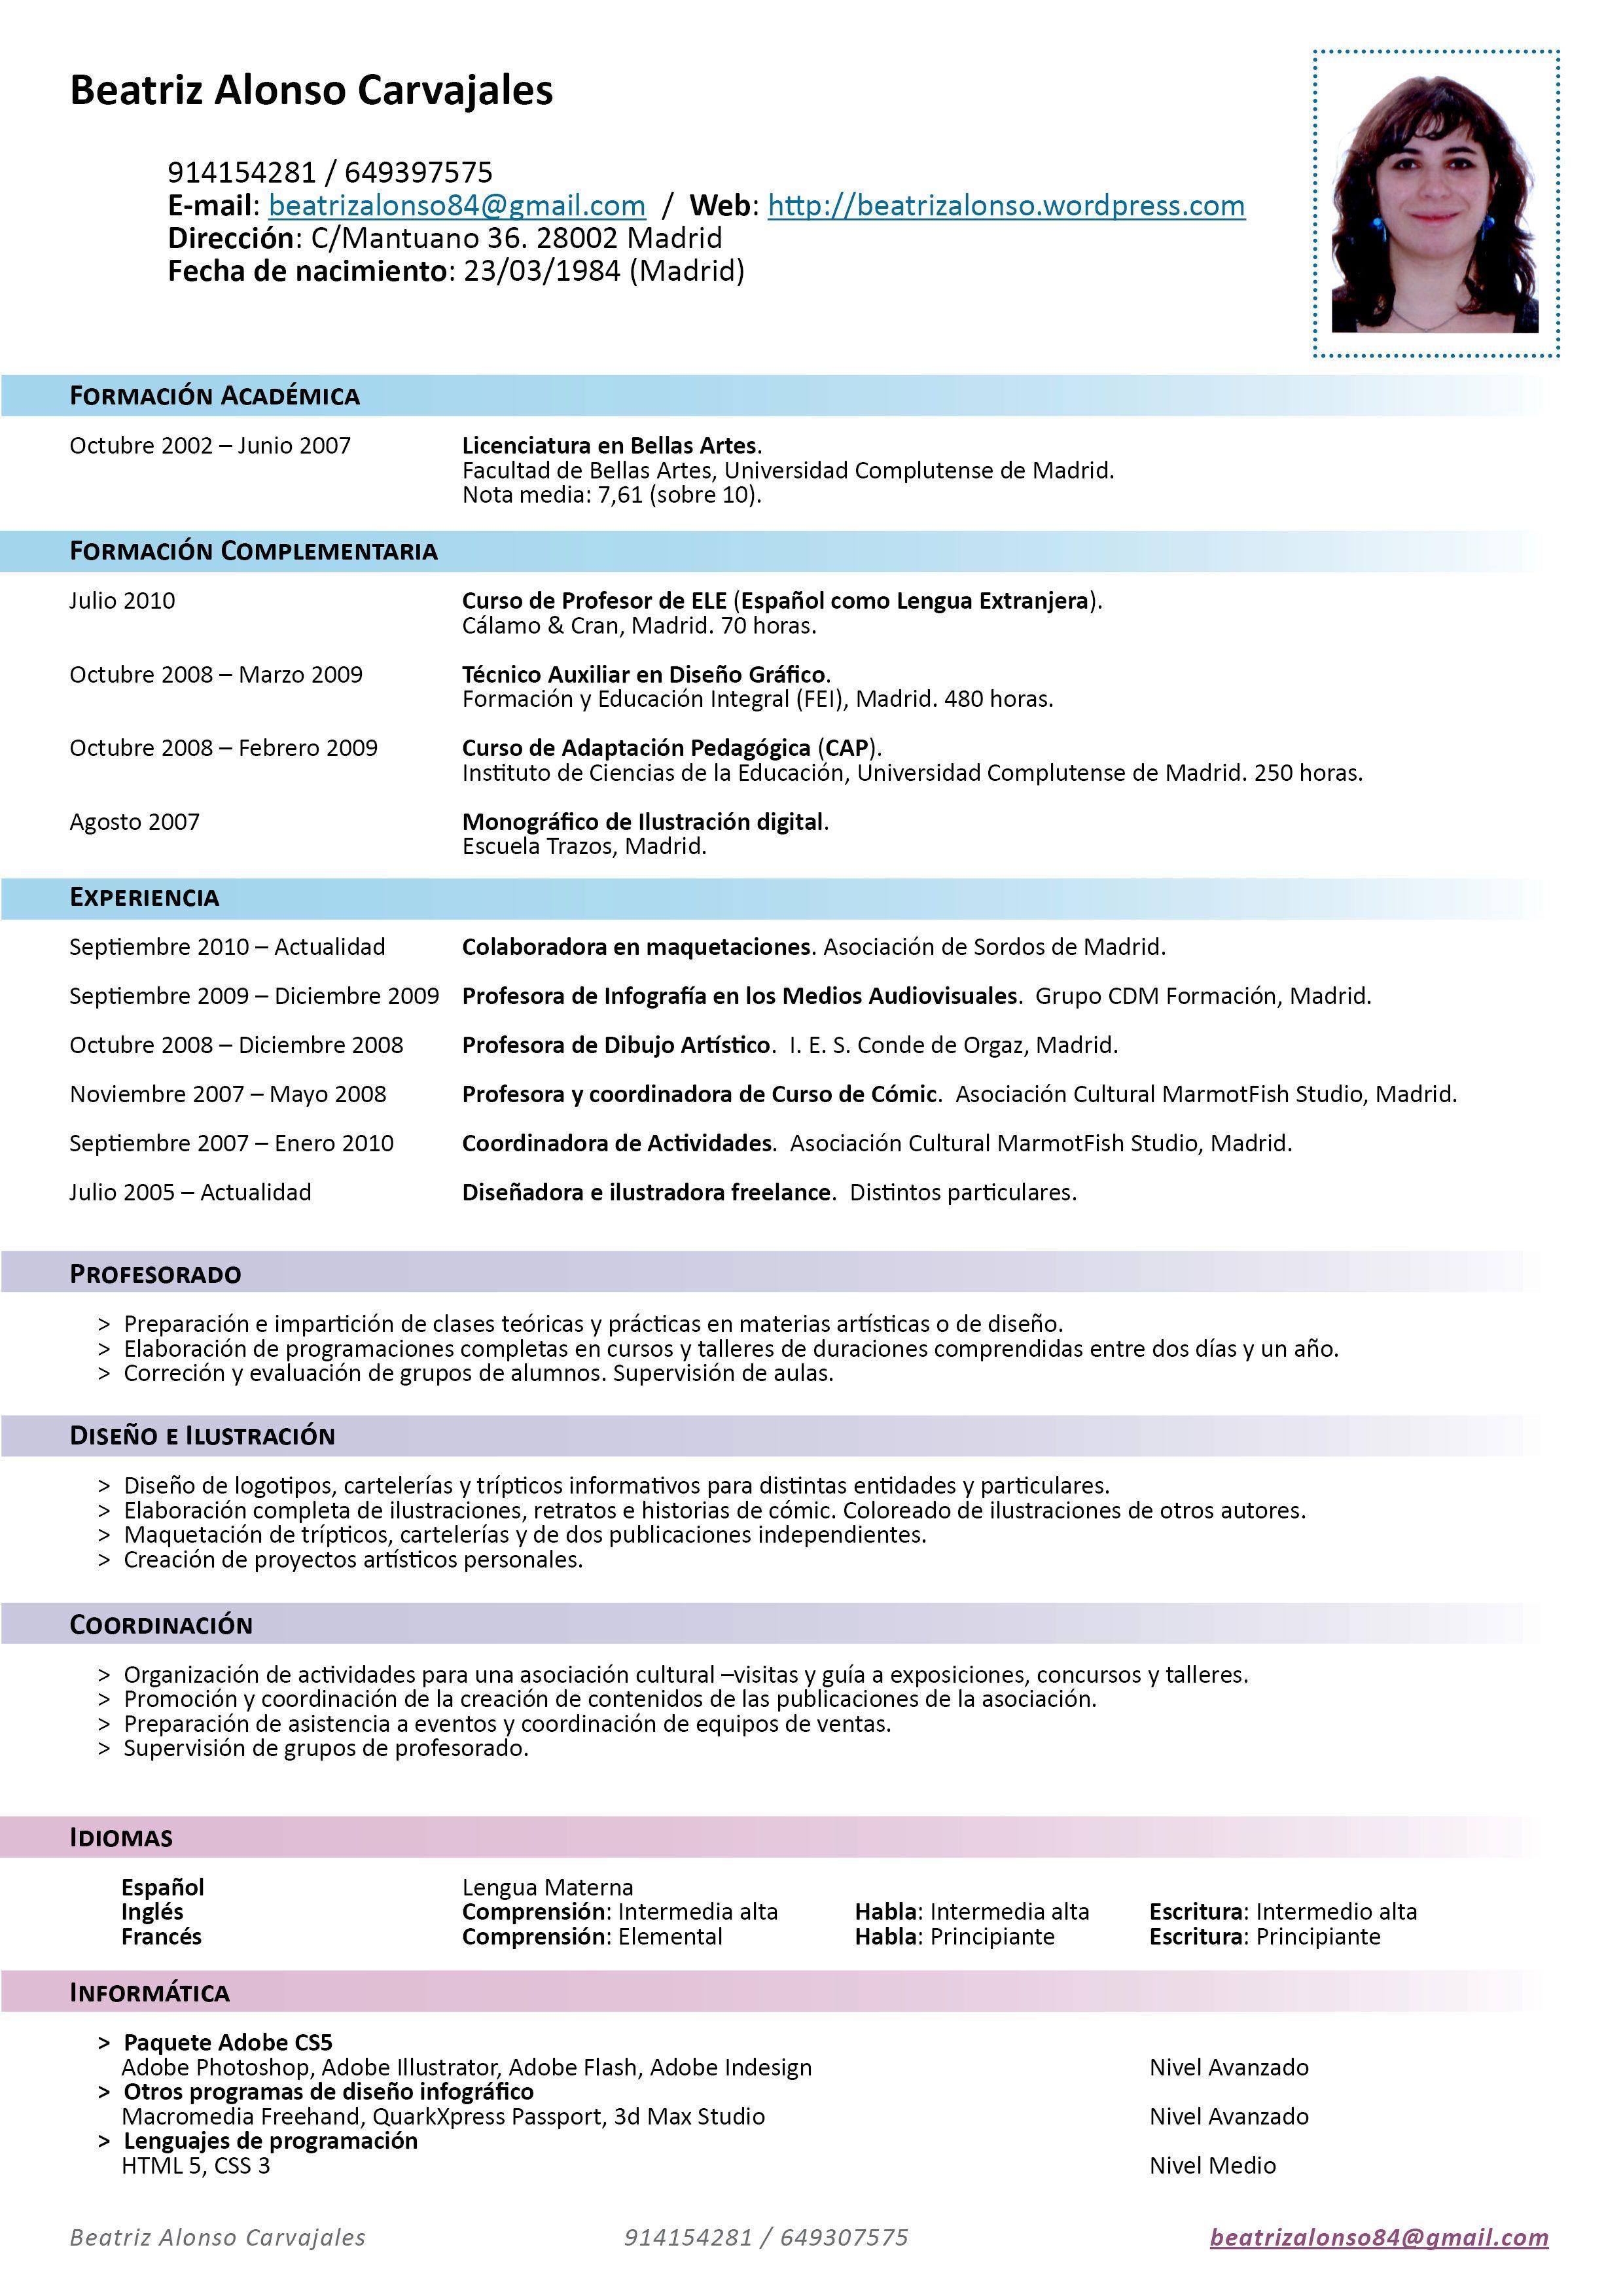 Modelos En Espanol De Curriculum Vitae Modelo De Curriculum Vitae Curriculum Vitae Job Resume Format Job Resume